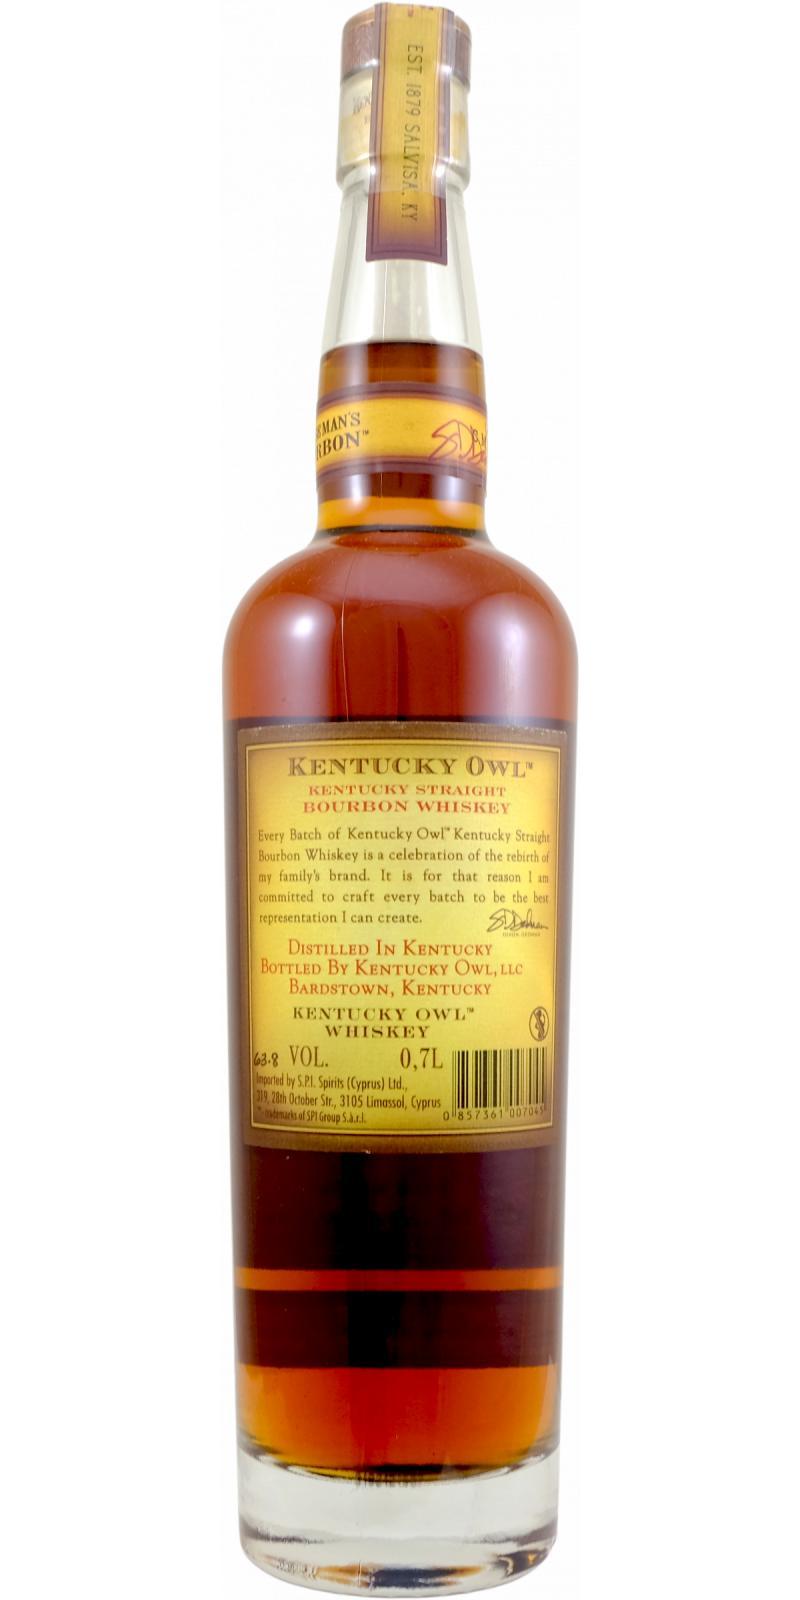 Kentucky Owl Kentucky Straight Bourbon Whiskey